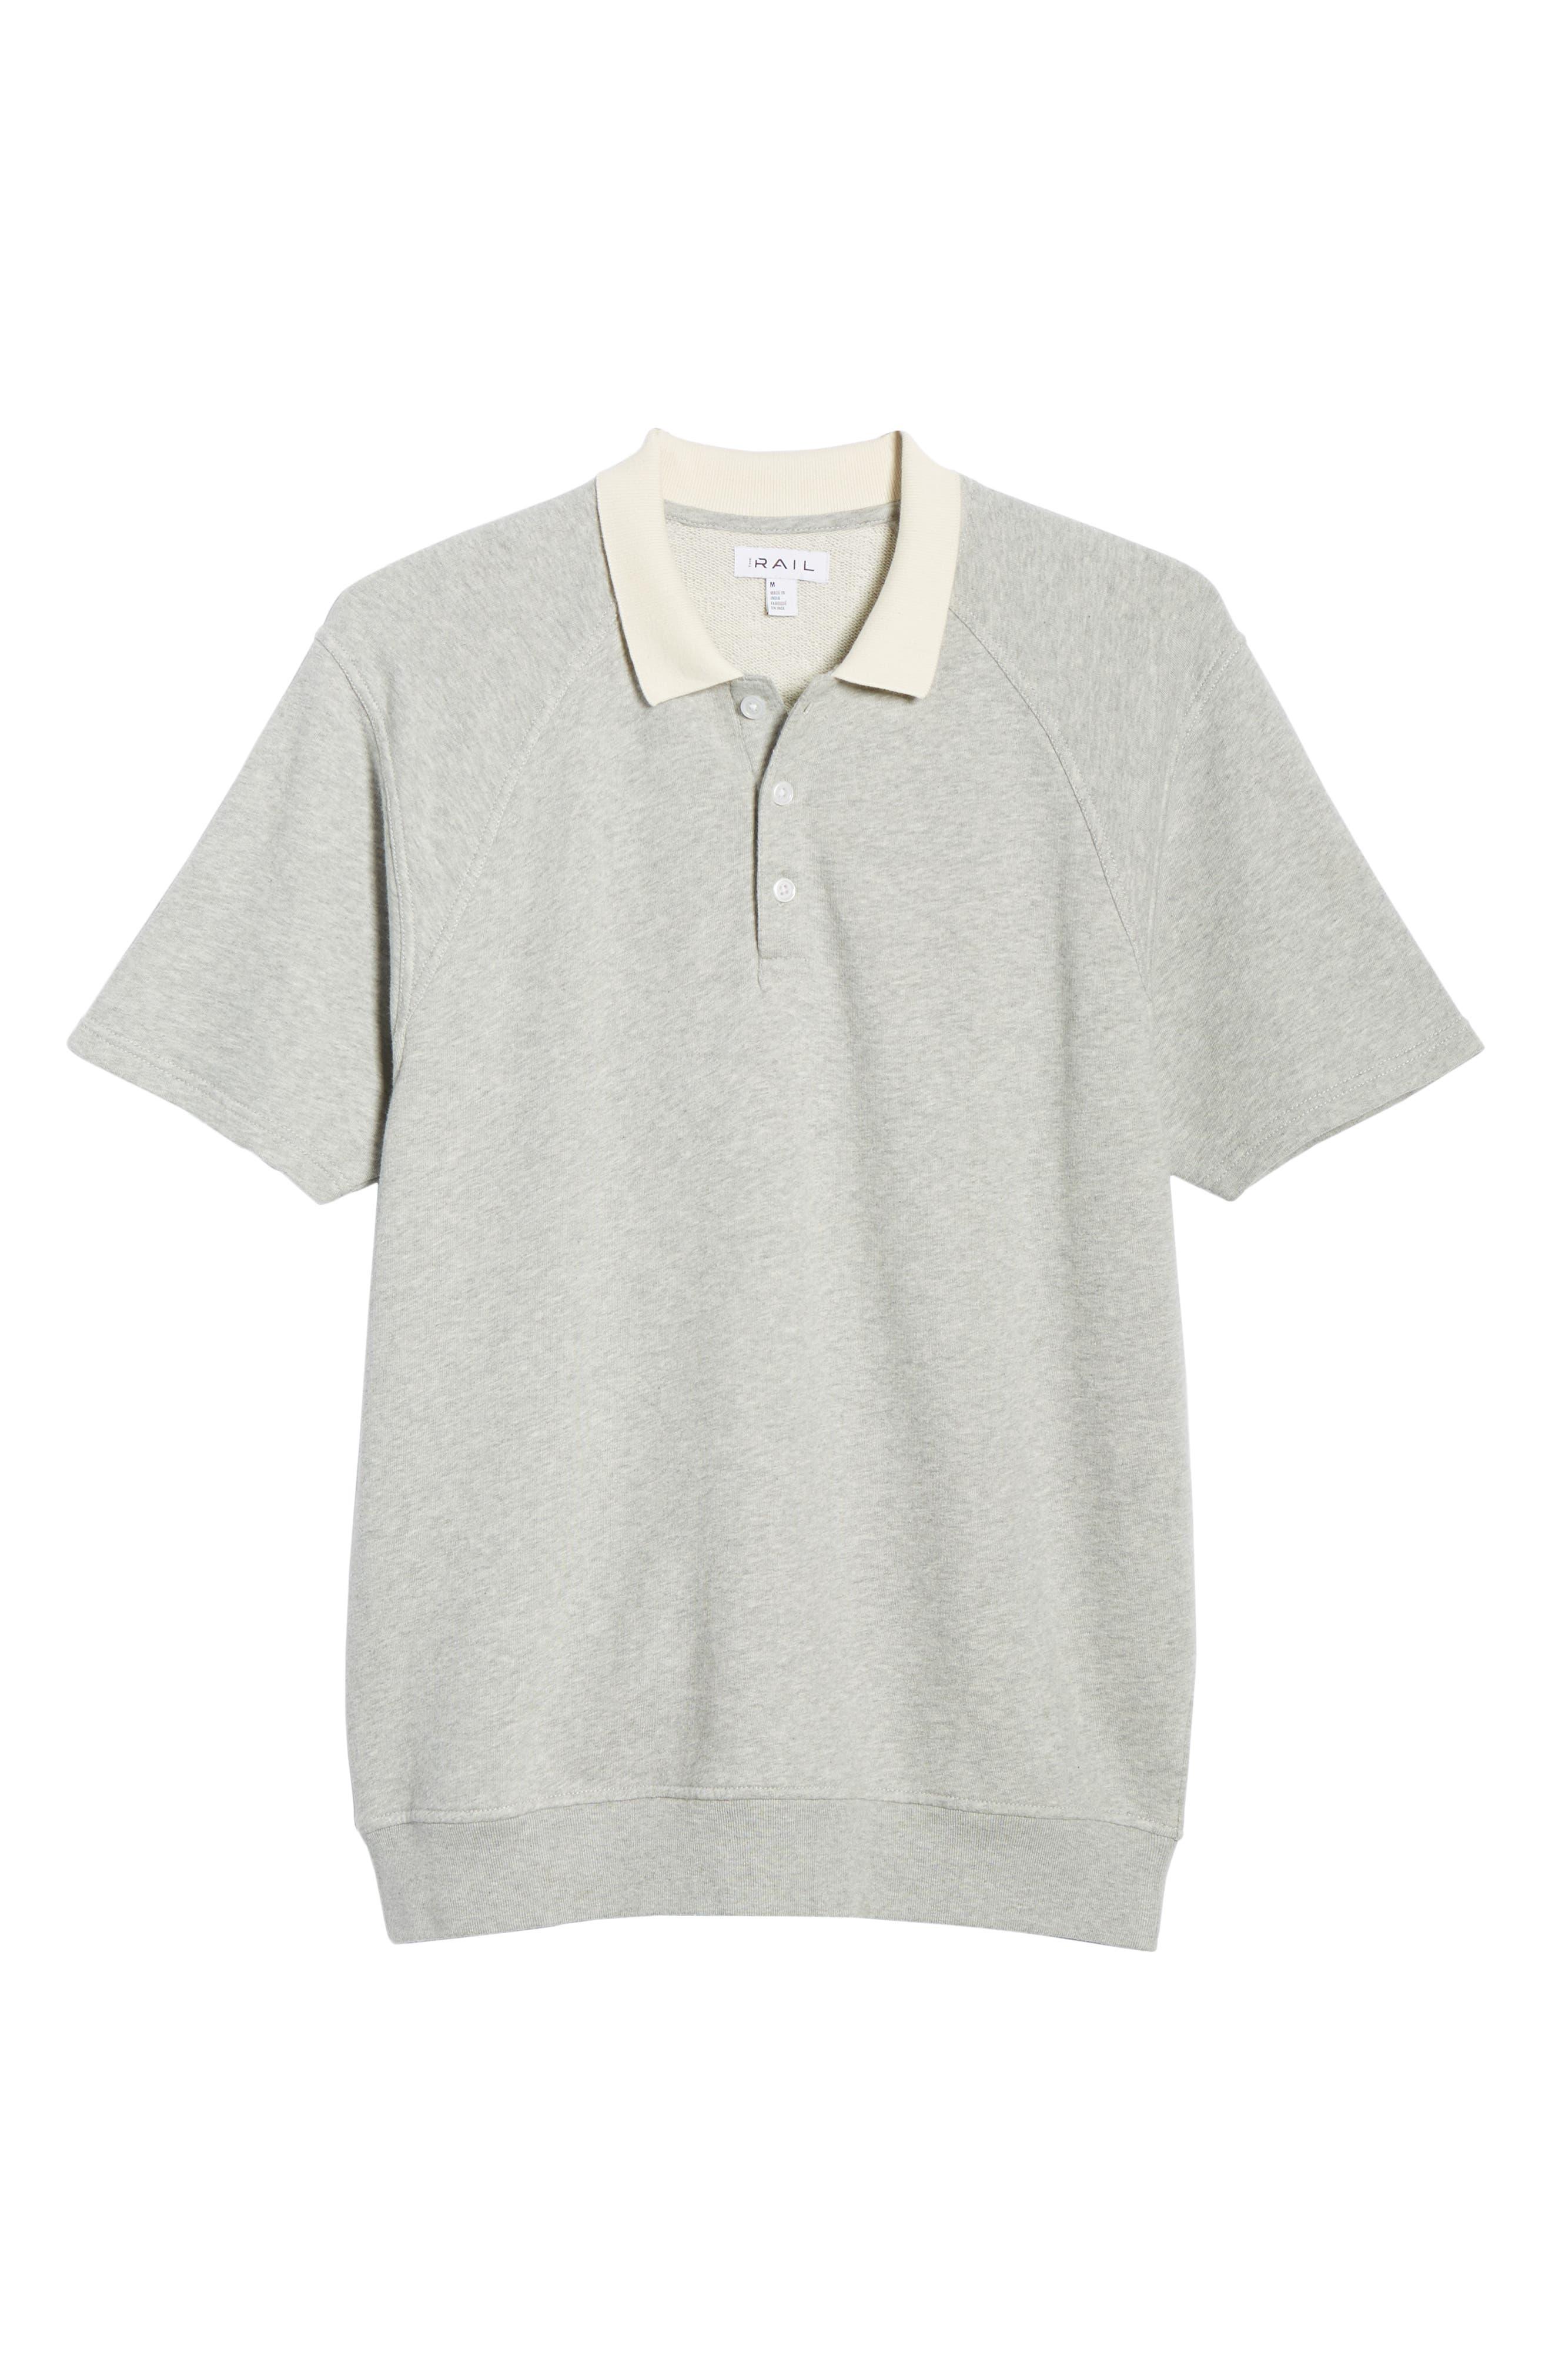 THE RAIL, Short Sleeve Rugby Shirt, Alternate thumbnail 6, color, GREY ASH HEATHER